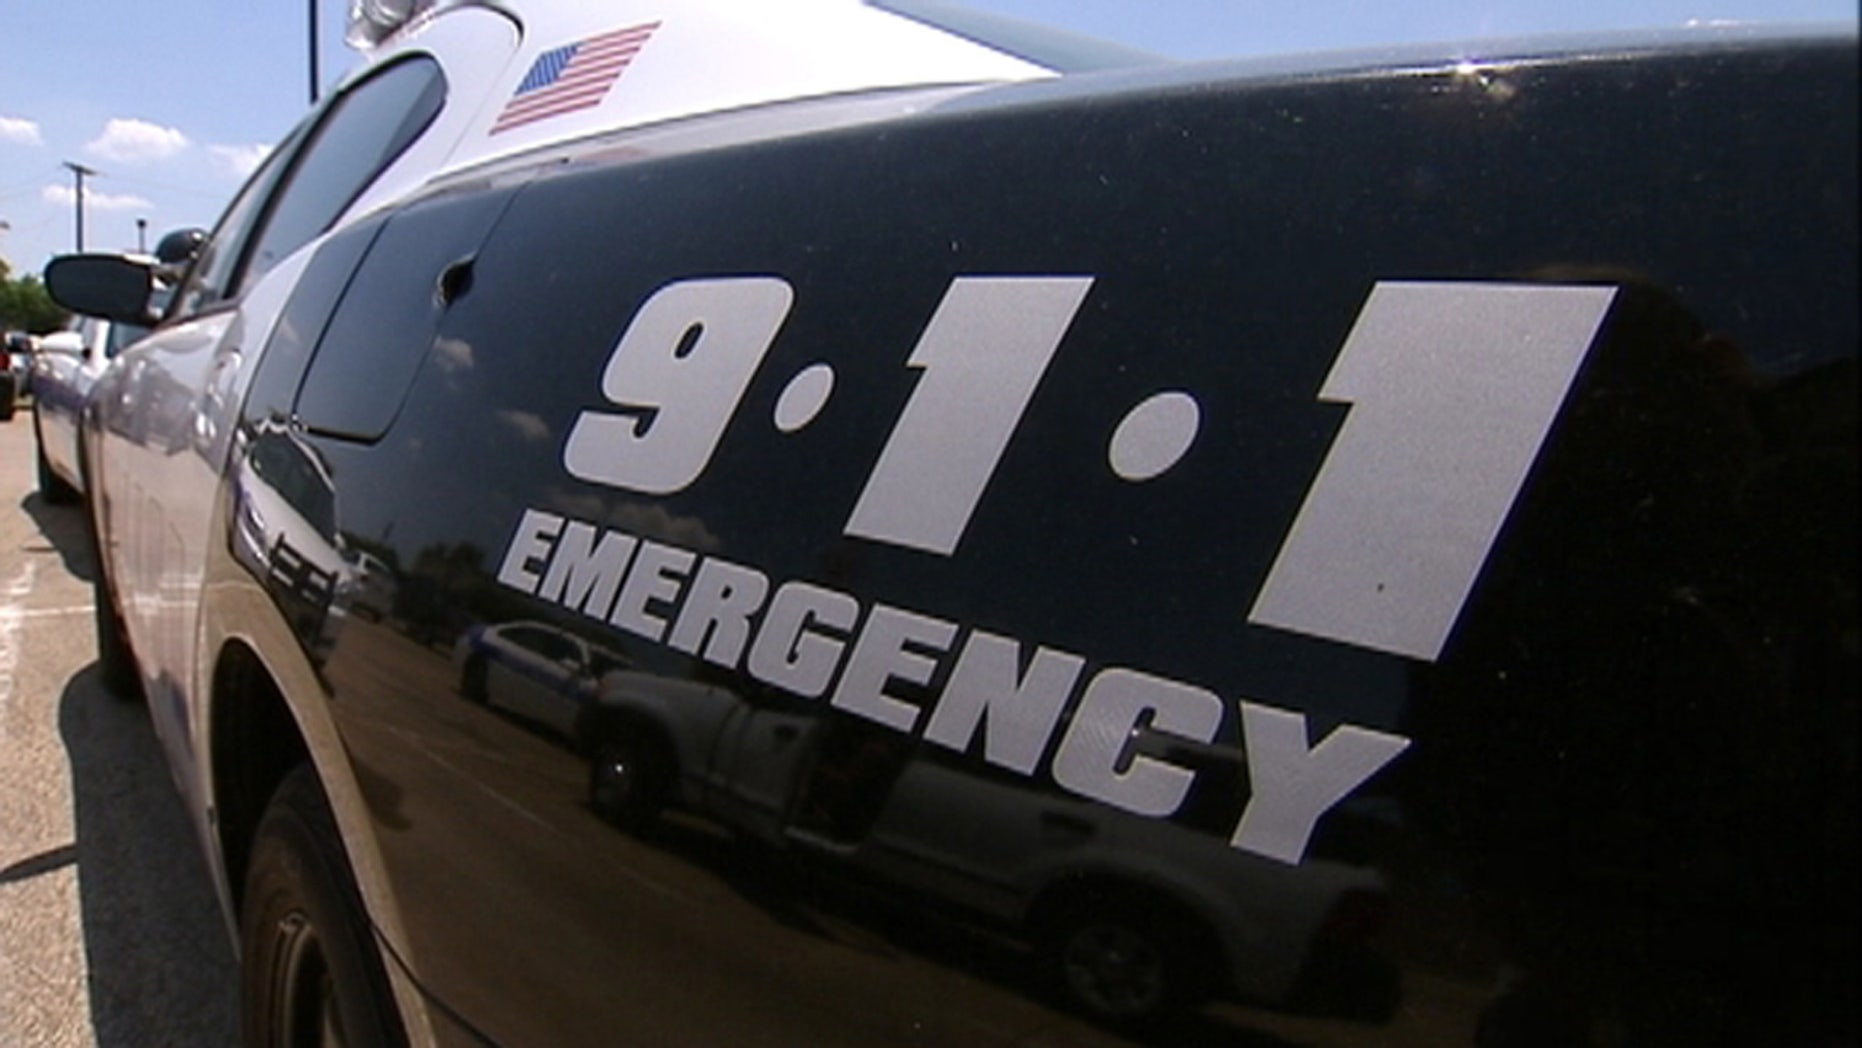 Dallas police vehicle